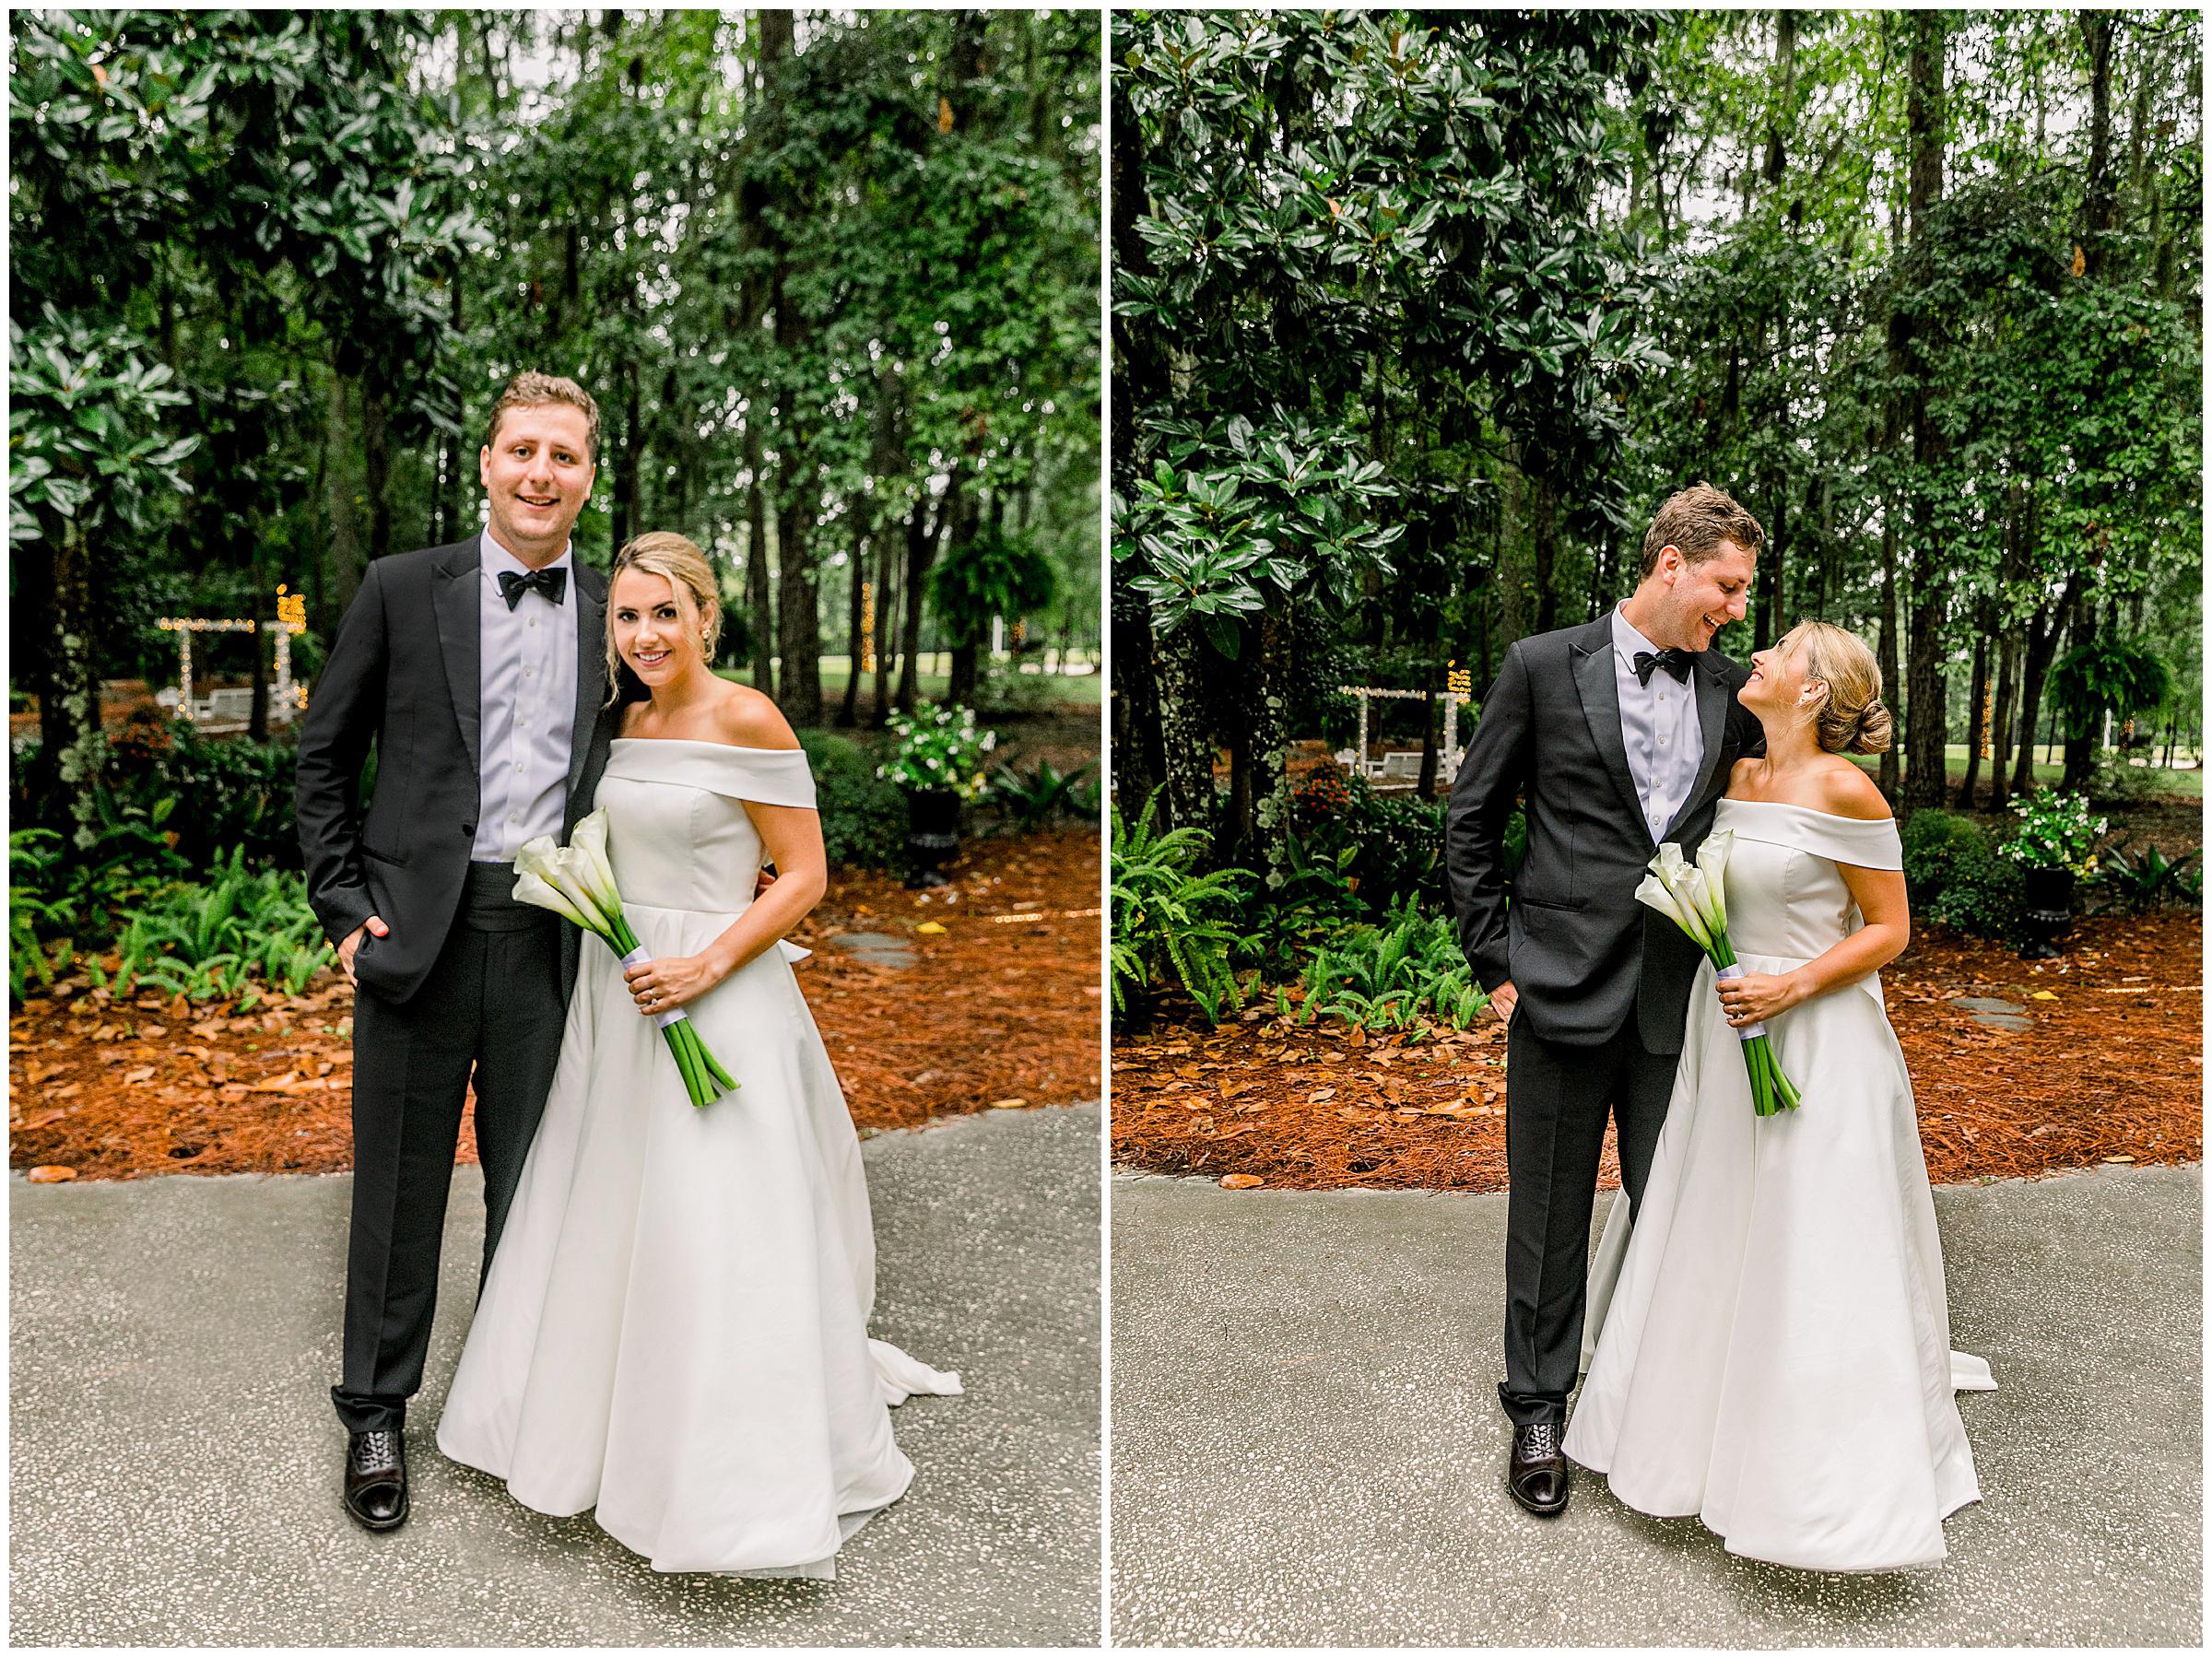 KIP EDGEMON WEDDING MACKEY HOUSE 6.jpg